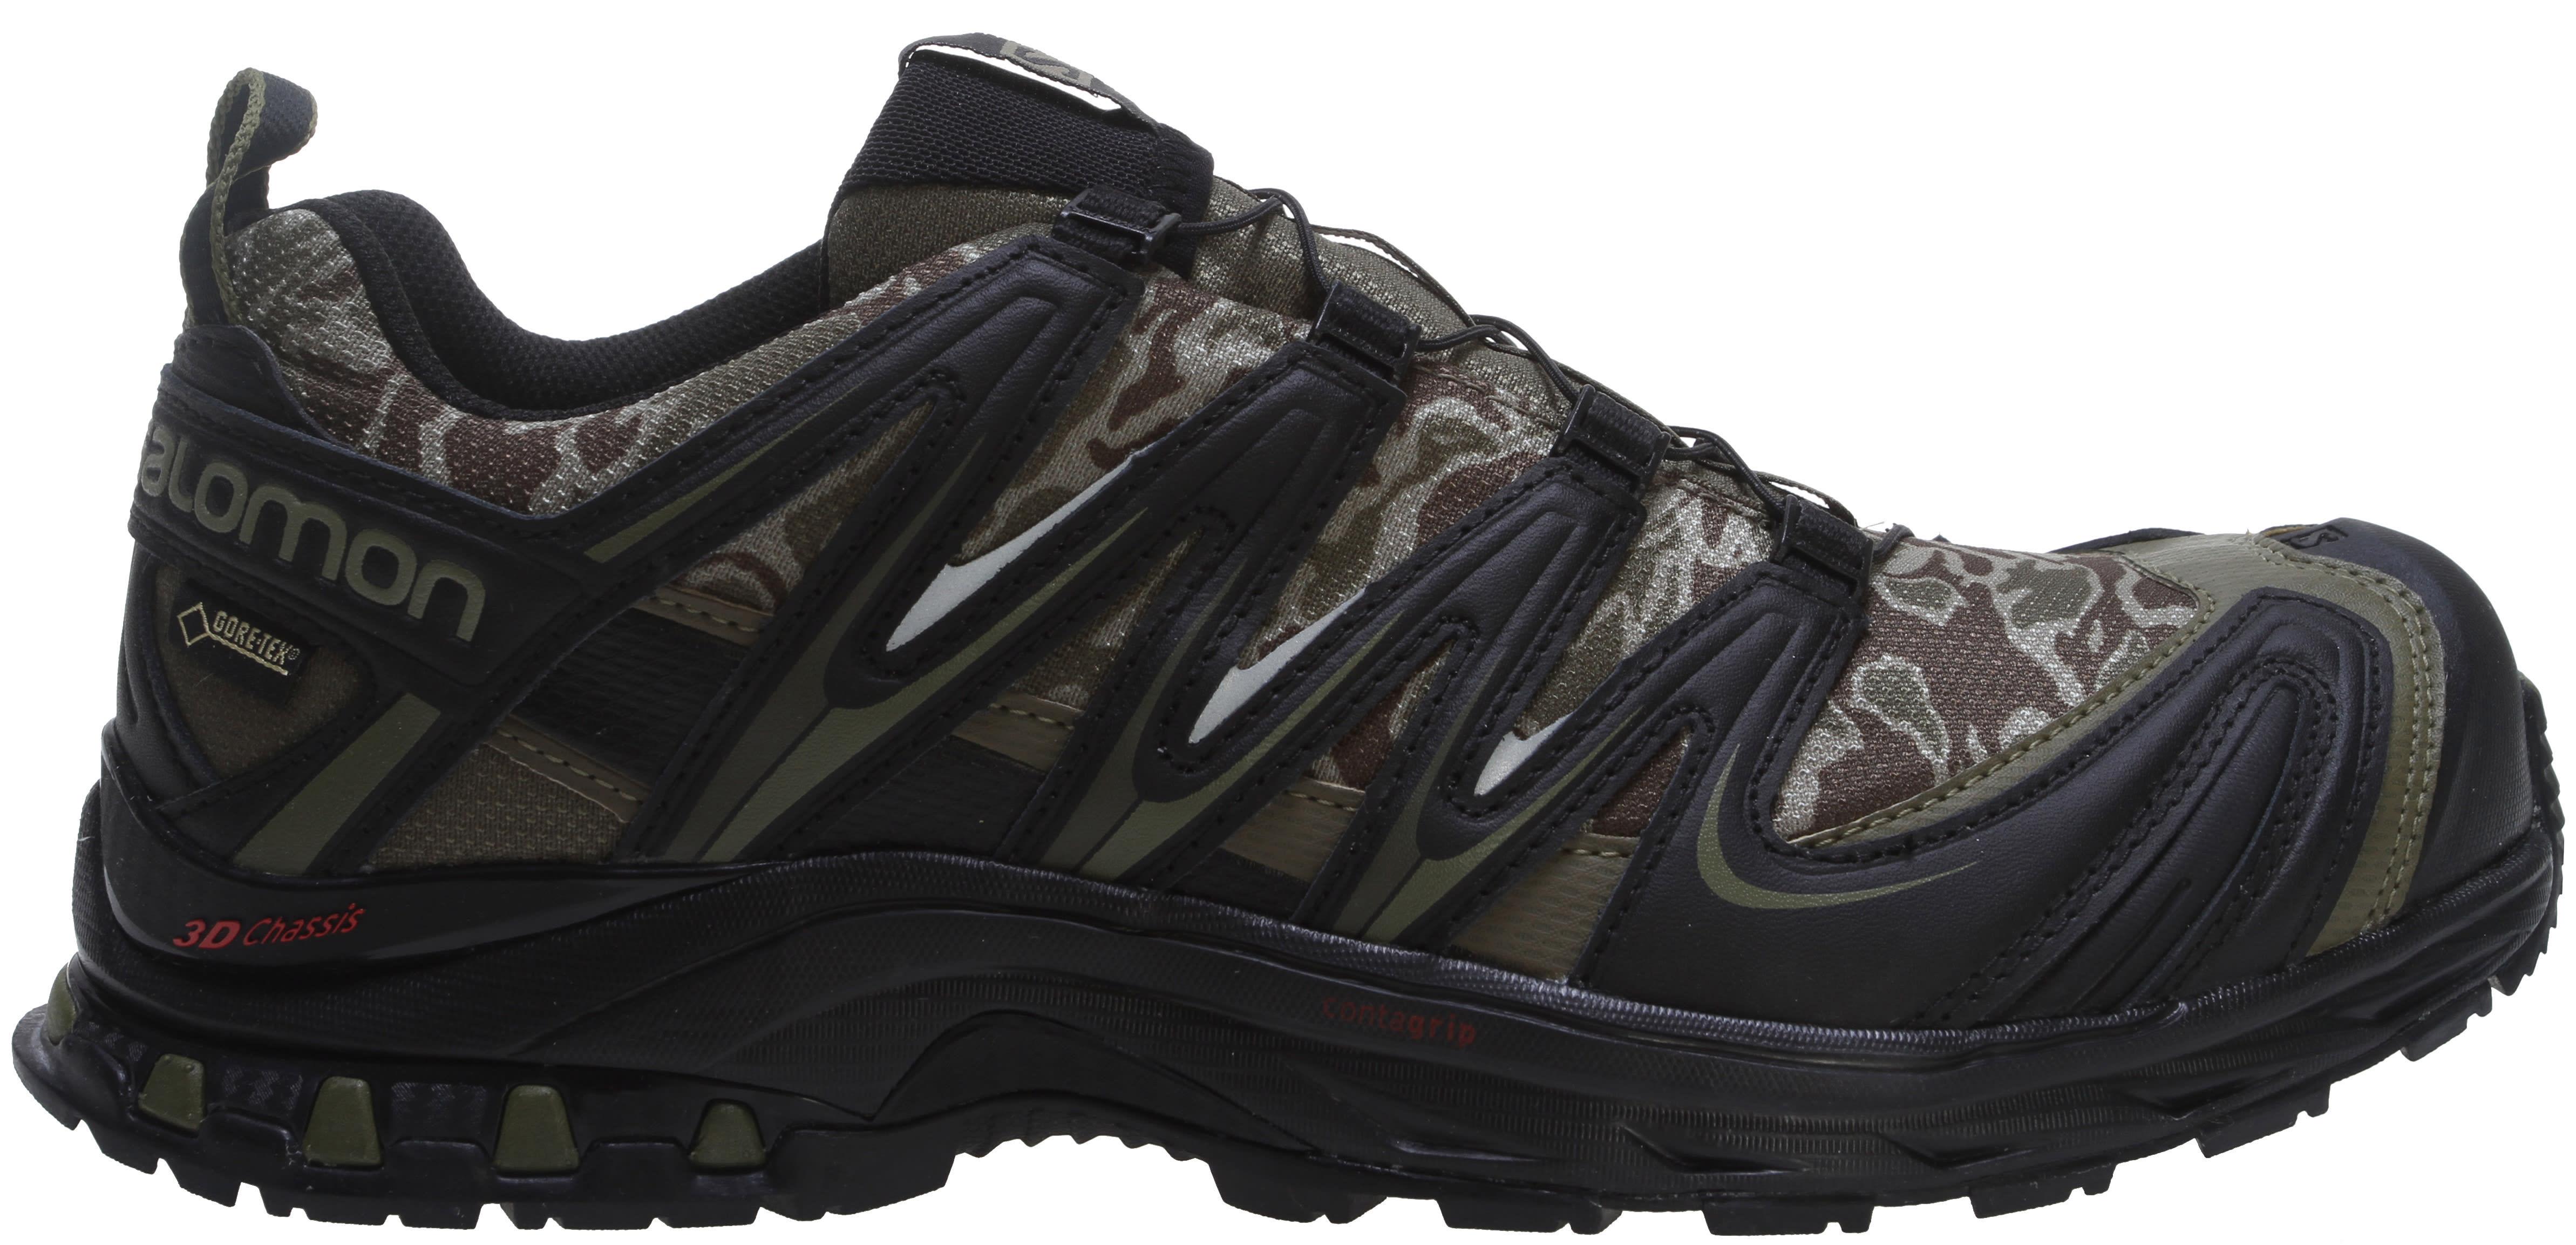 baf3e06abb20c Salomon XA Pro 3D GTX Trail Running Shoes - thumbnail 1